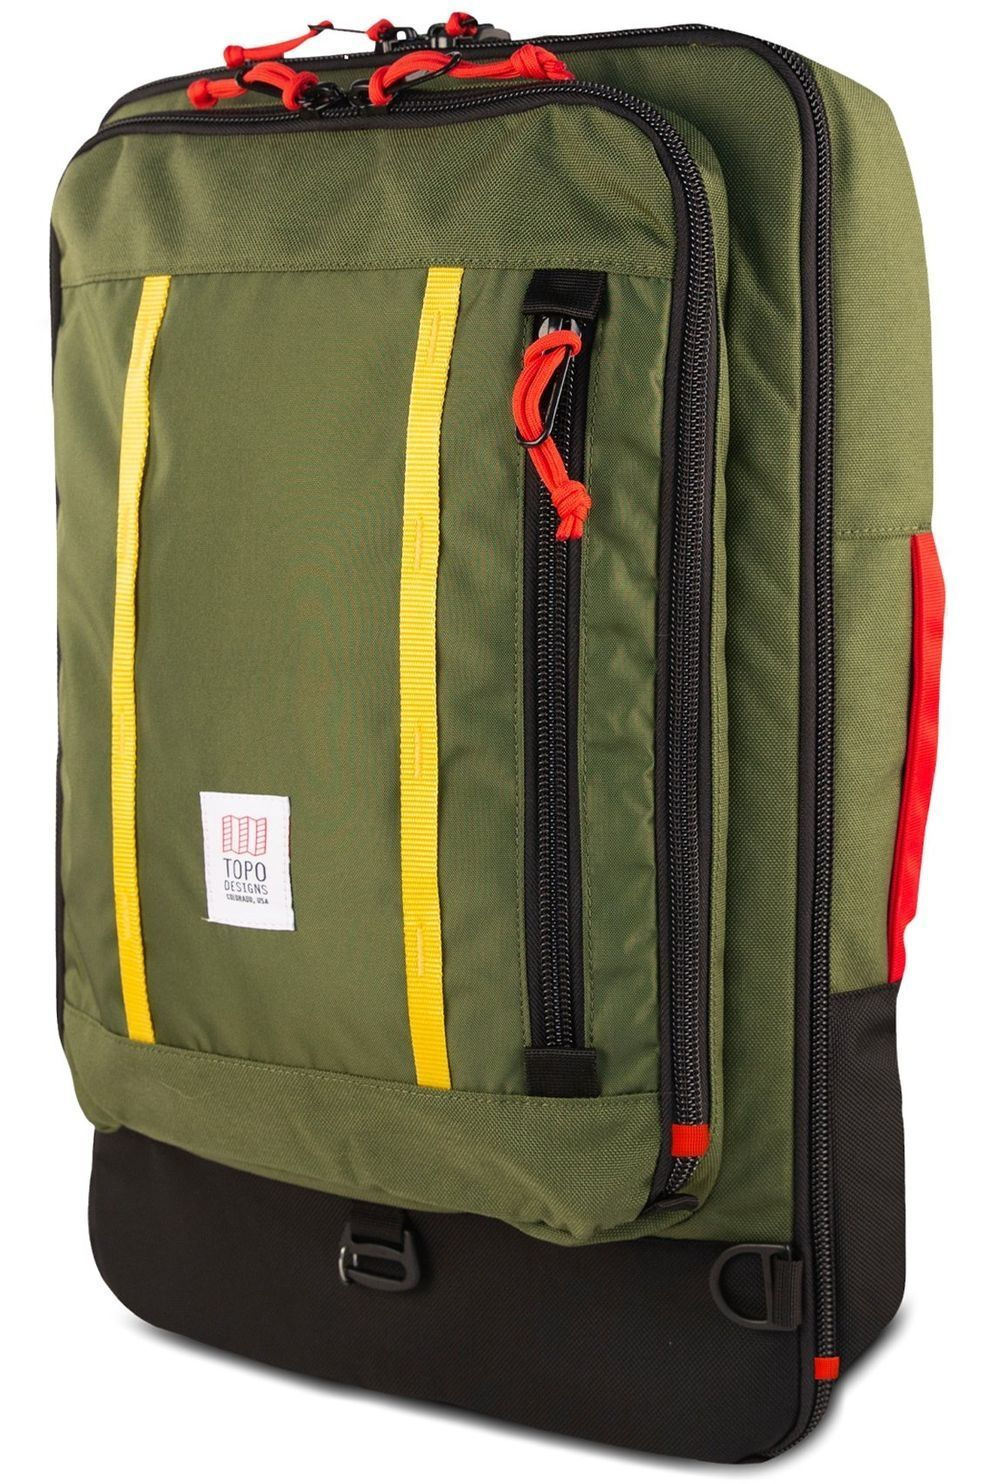 Topo Designs Travelpack Travel Bag 40L - Groen/Rood